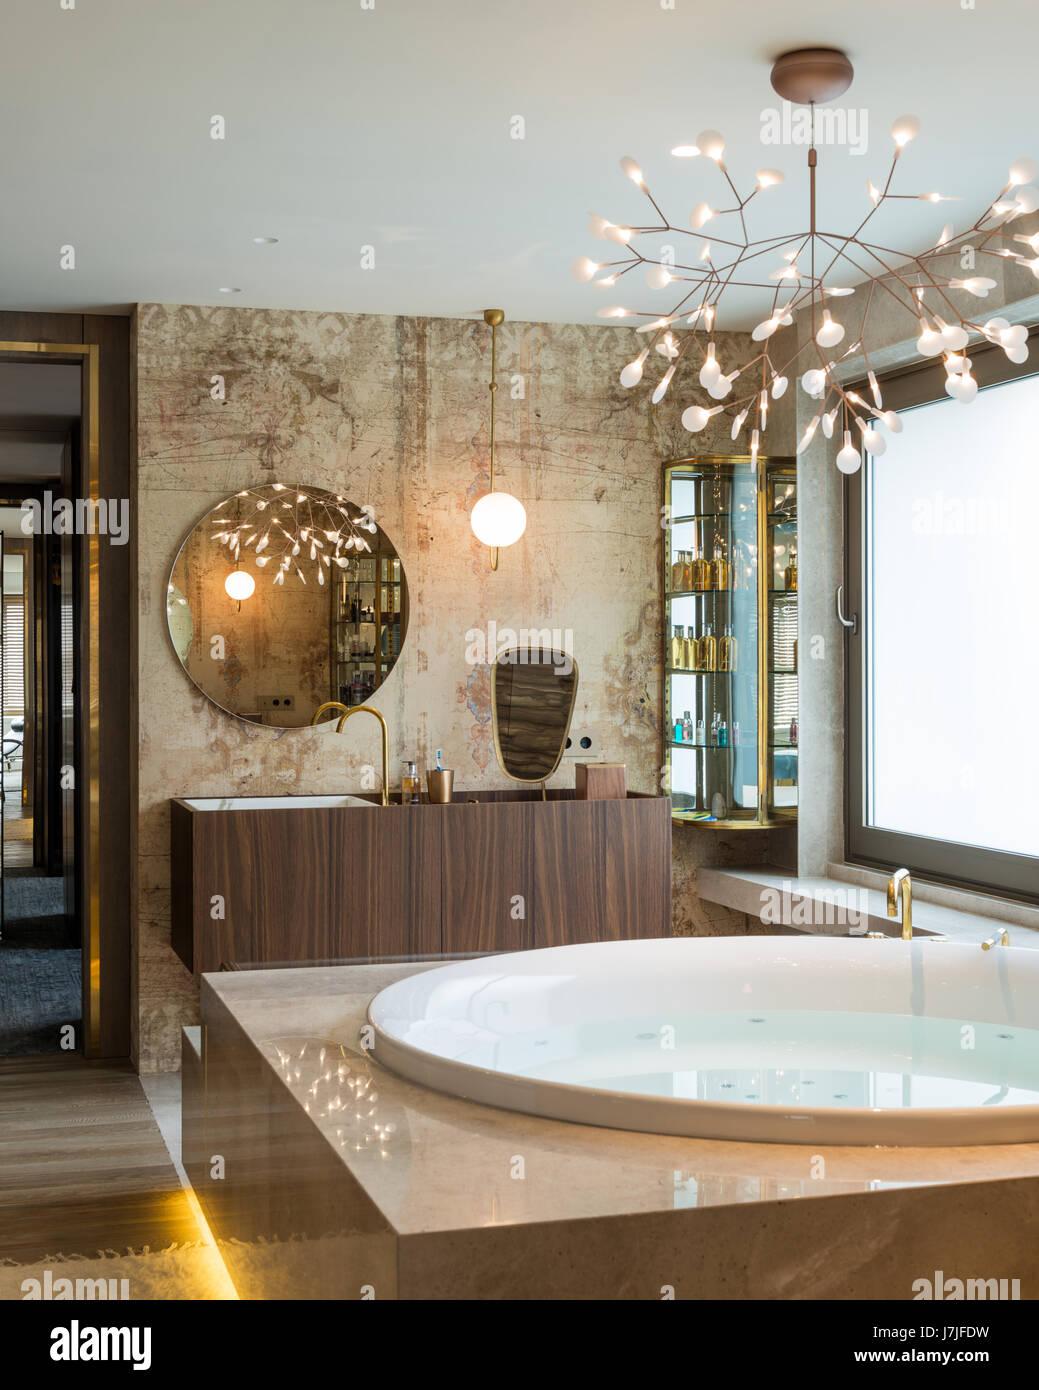 frosted glass bathroom stockfotos frosted glass bathroom bilder alamy. Black Bedroom Furniture Sets. Home Design Ideas